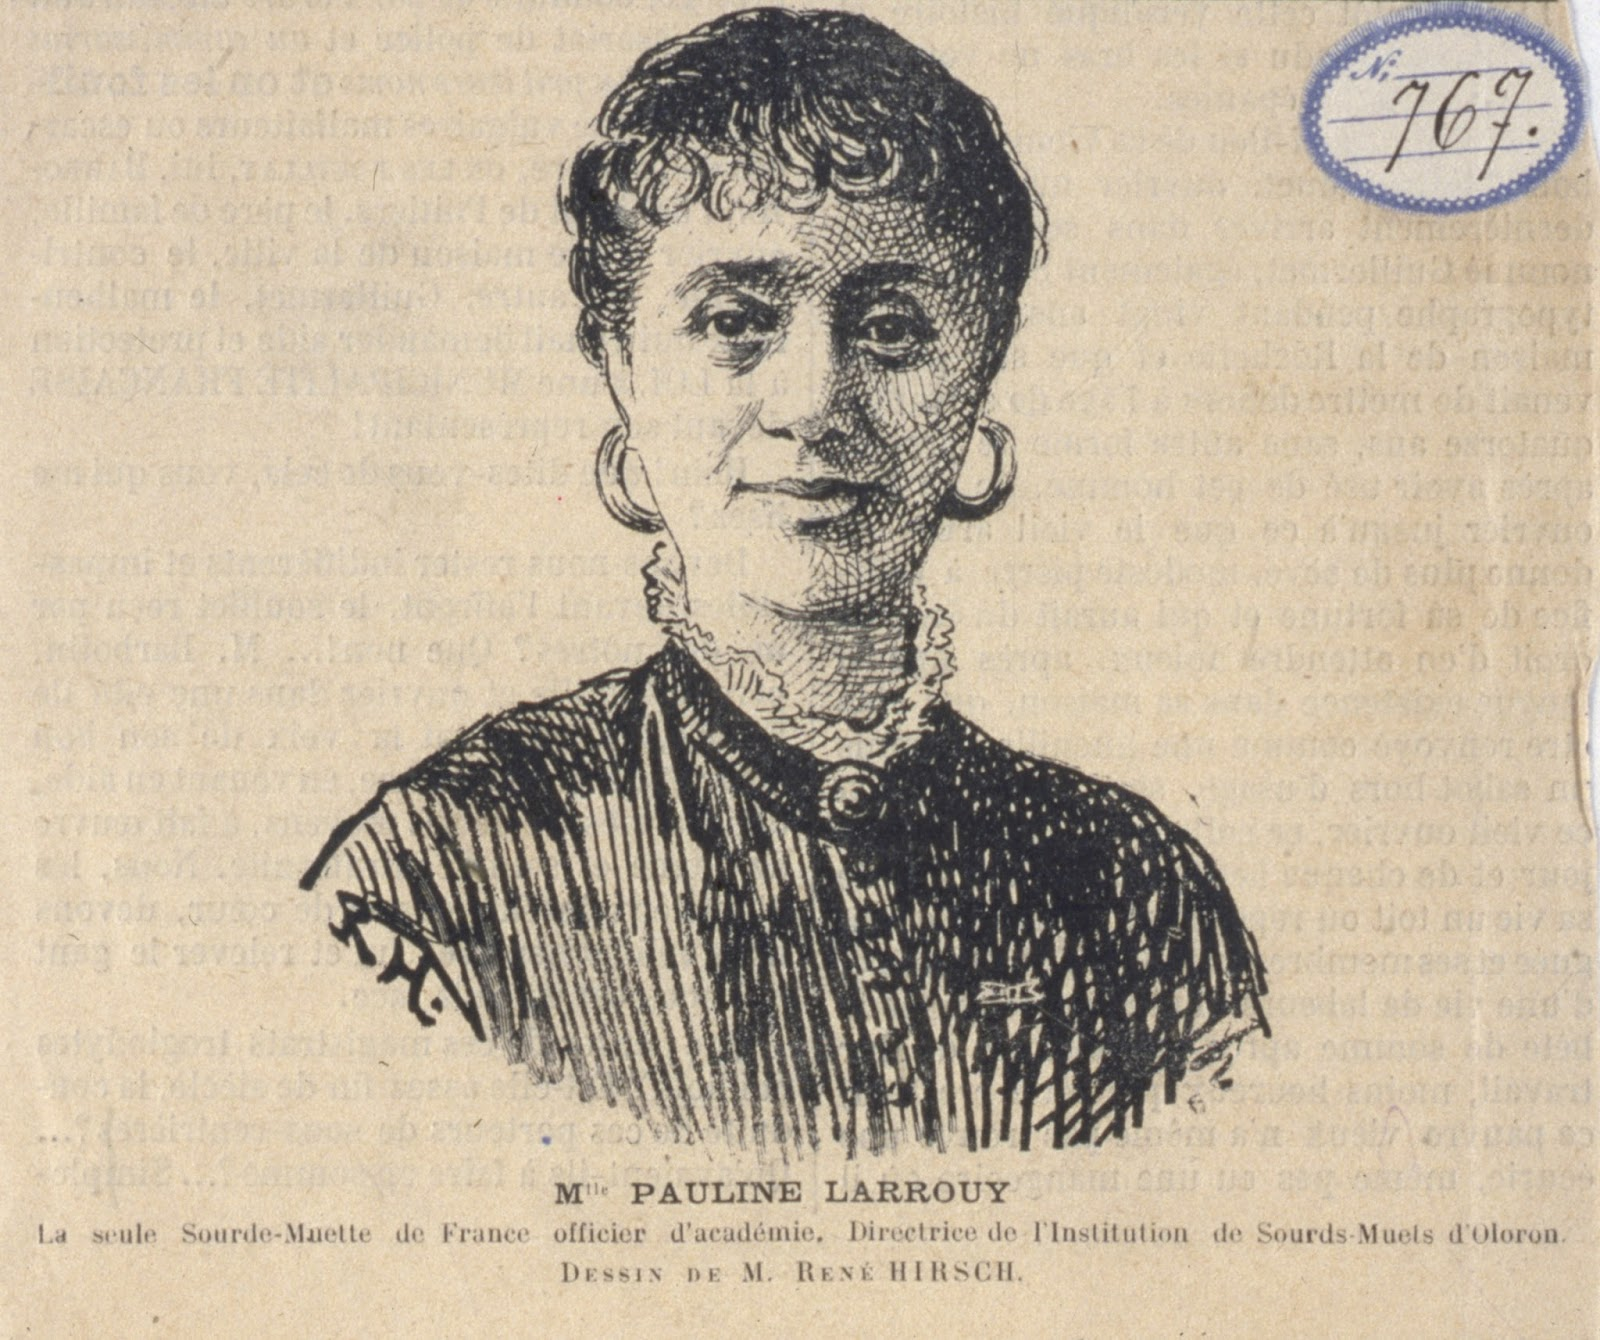 Sketched Portrait of Marie Pauline Larrouy